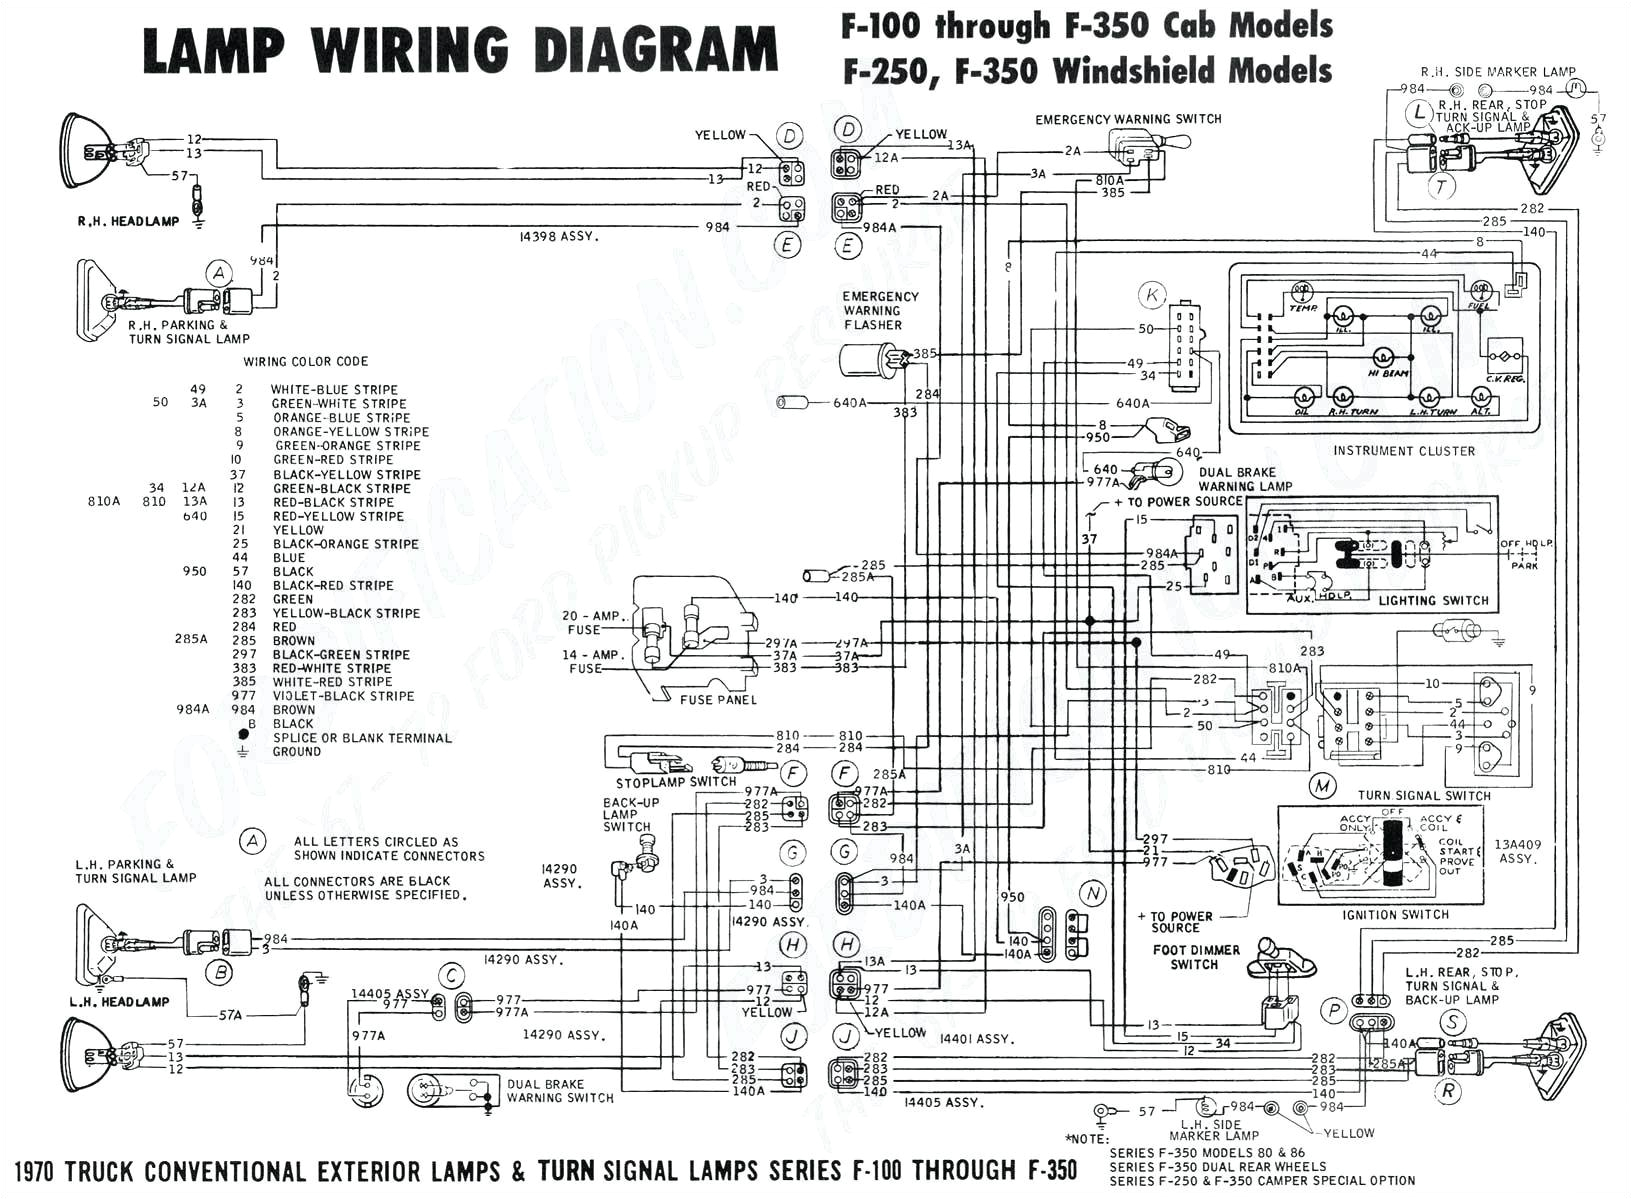 1979 f150 fuse diagram wiring diagram expert 79 ford f 150 fuse panel diagram